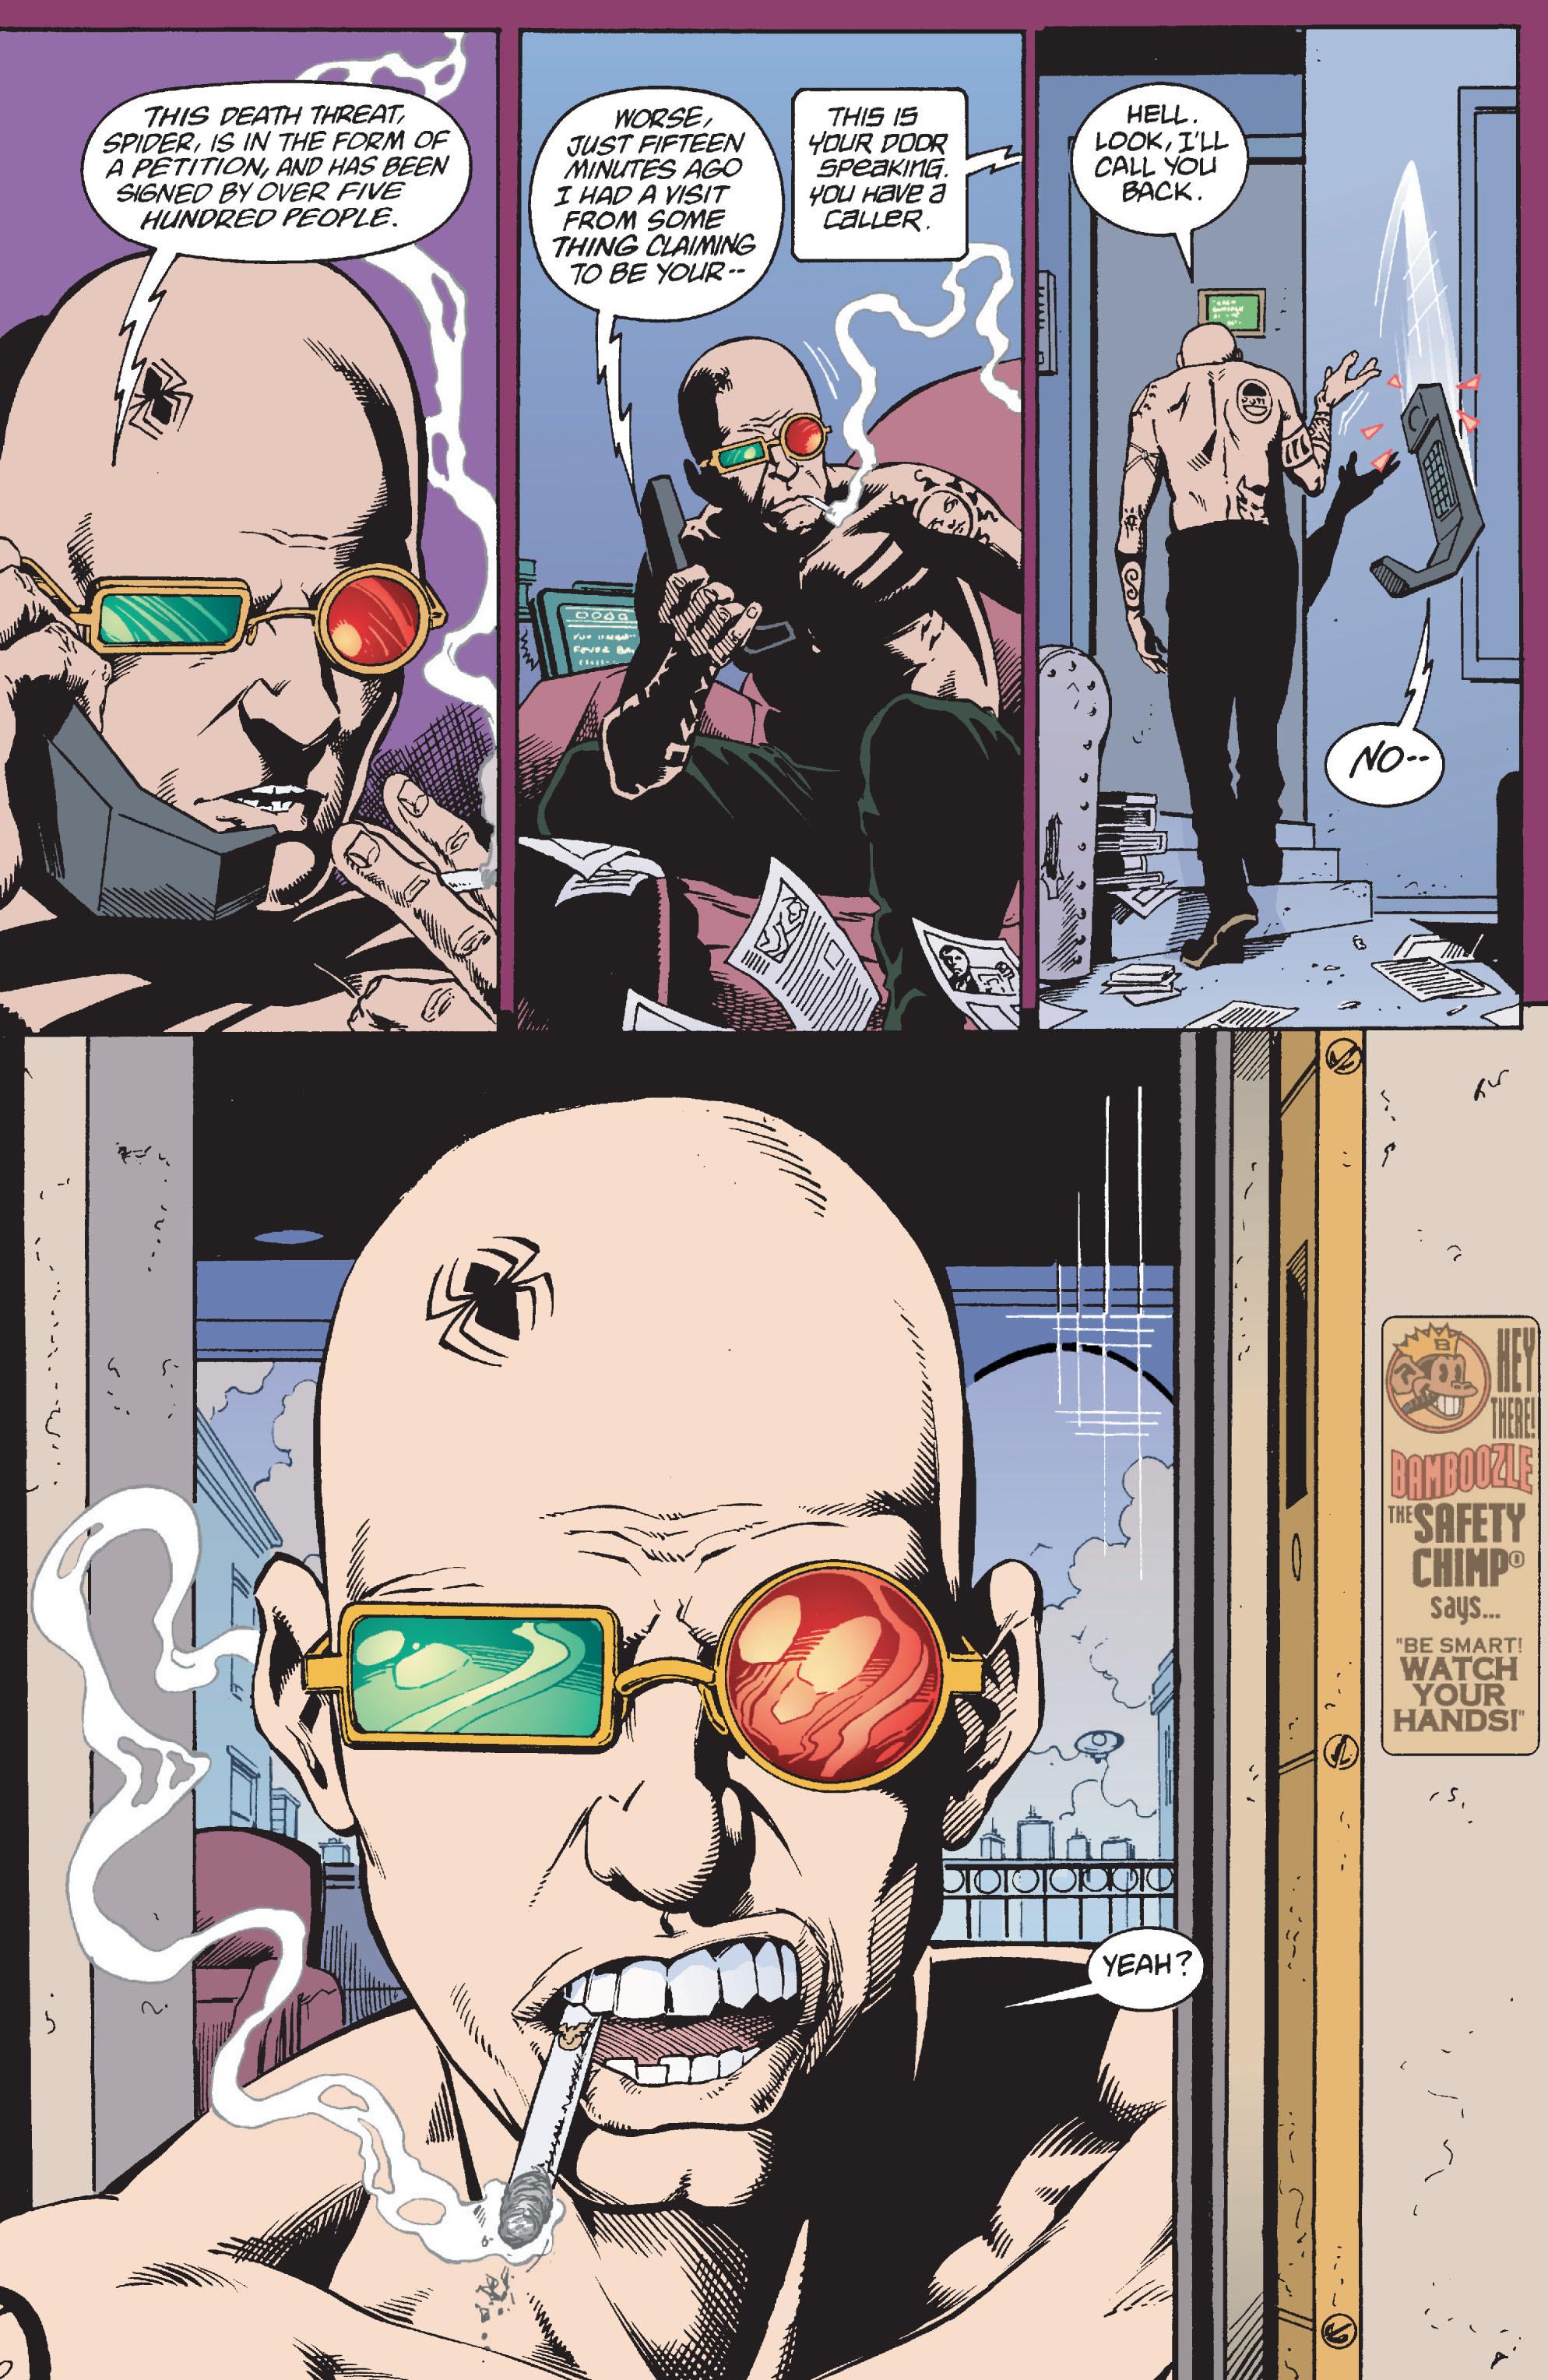 Read online Transmetropolitan comic -  Issue #10 - 7